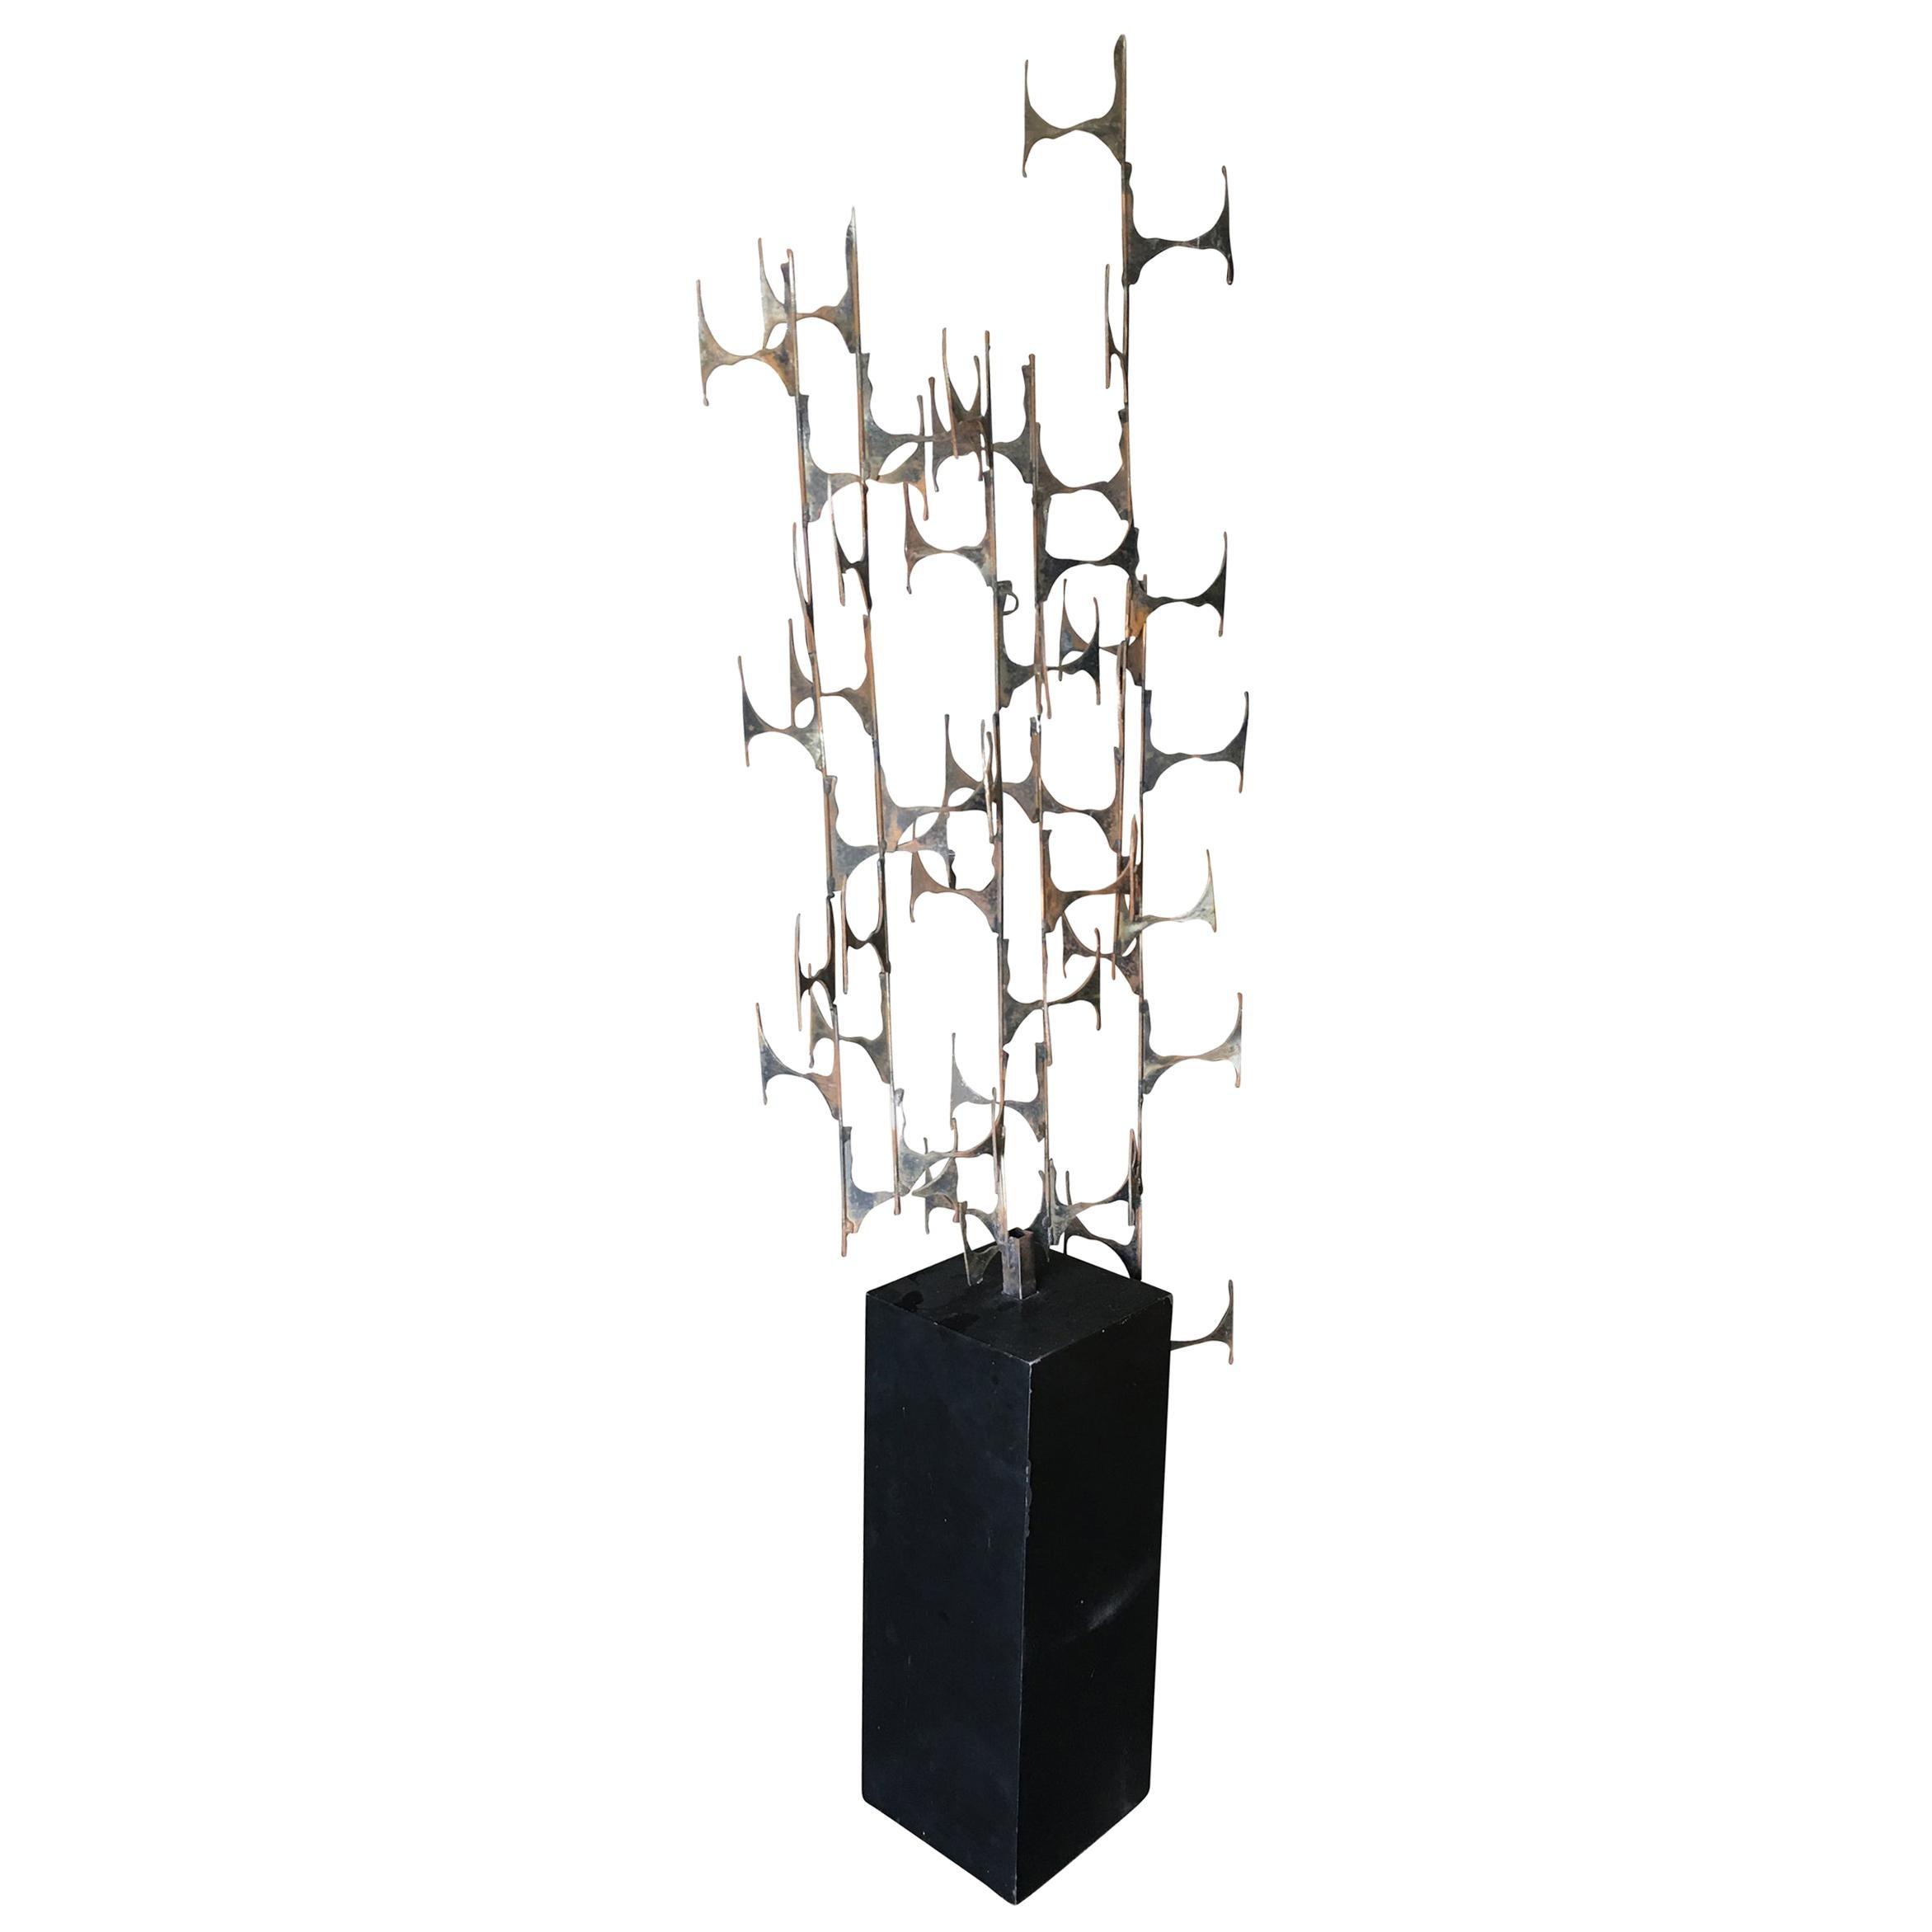 Abstract Brutalist Cut Steel Floor Sculpture on Black Pedestal